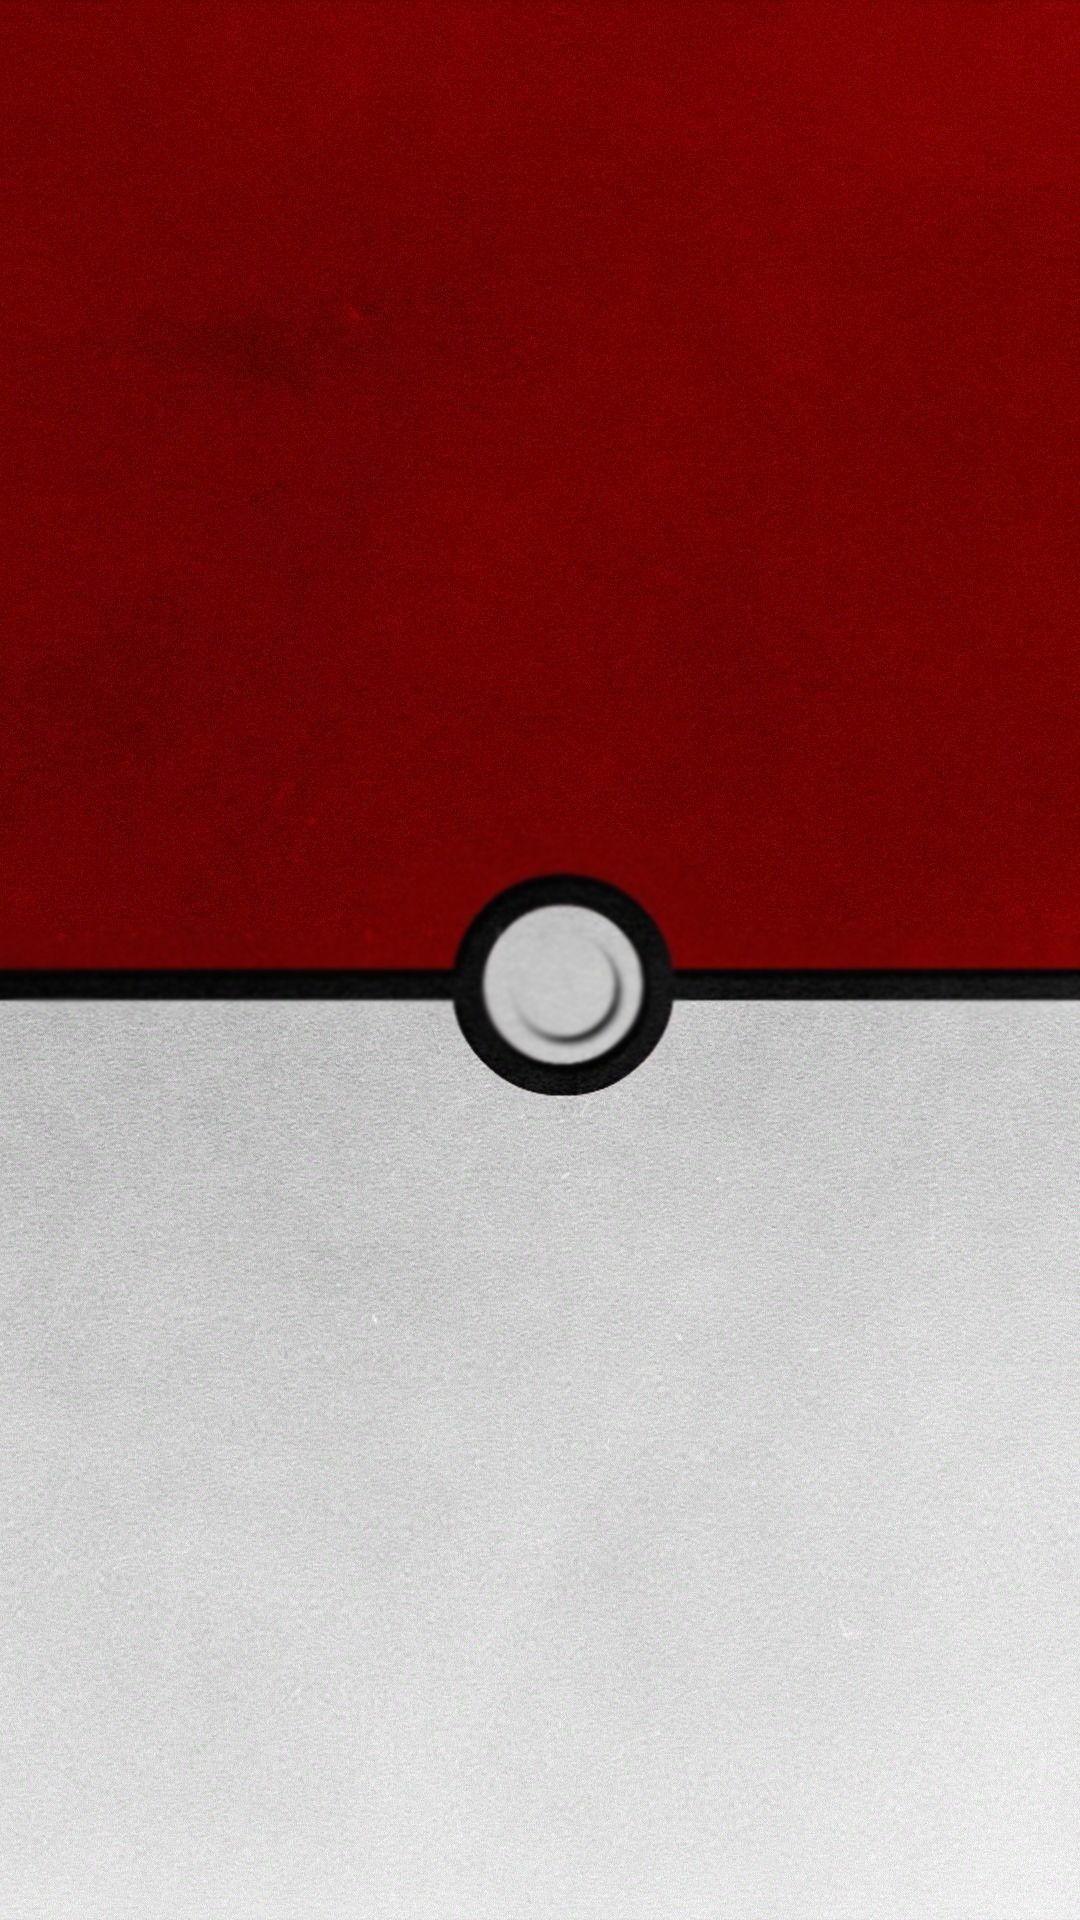 Pokemon Master Ball IPhone 6 Plus Wallpaper